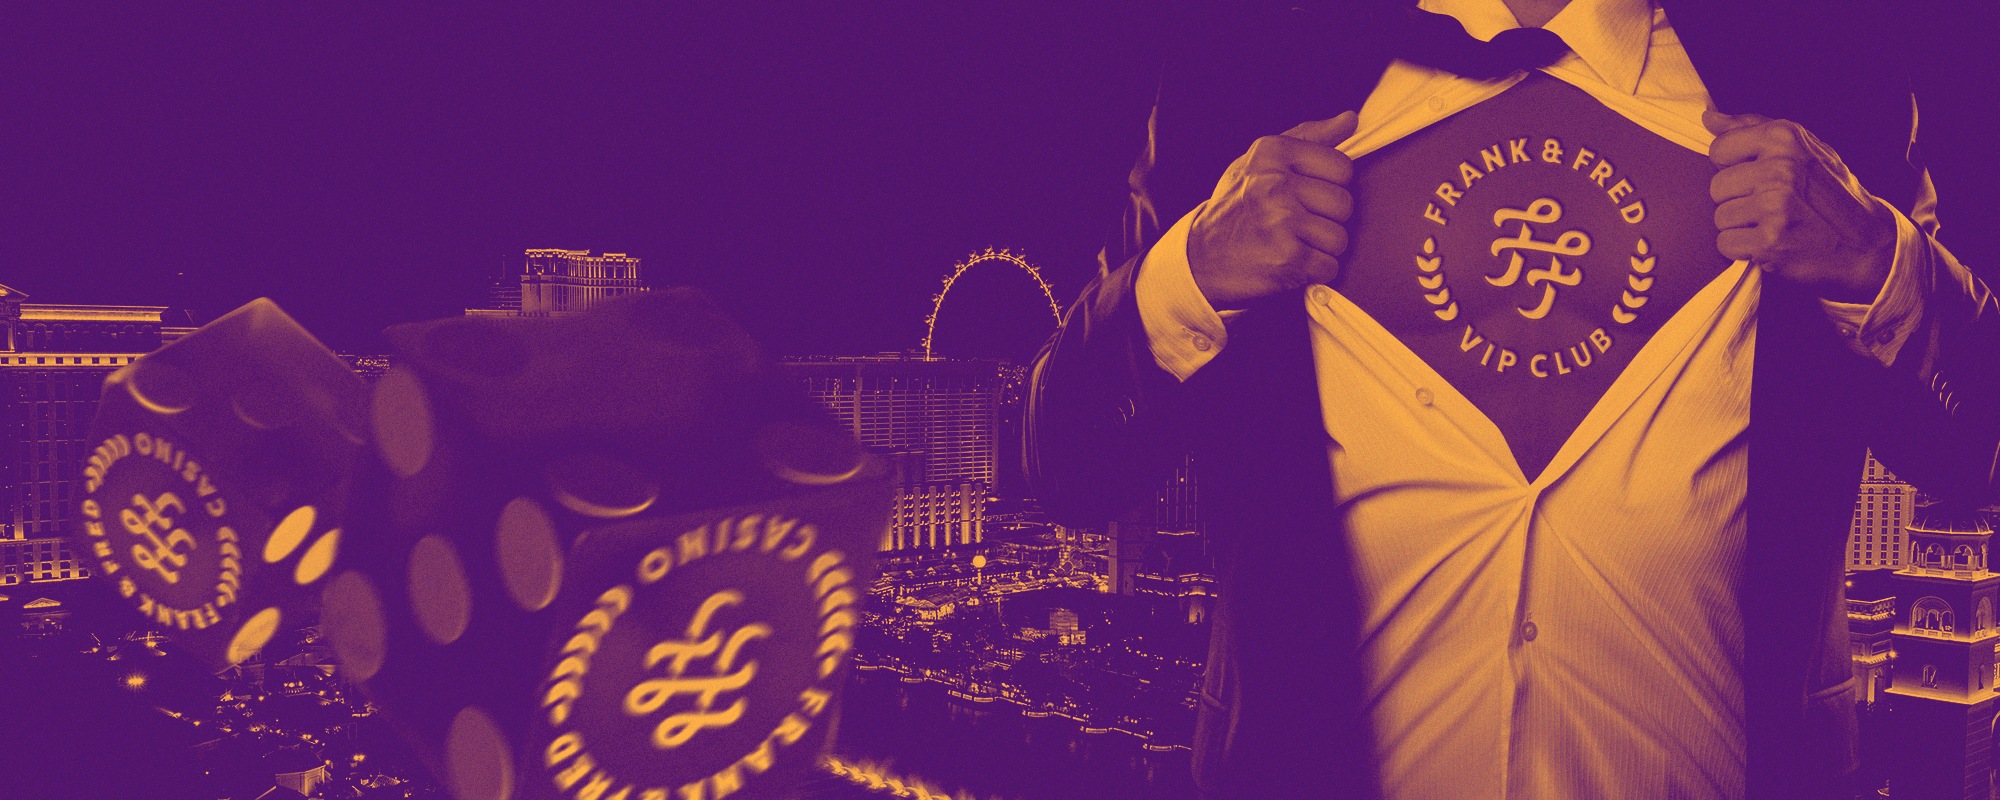 Frank & Fred Casino VIP